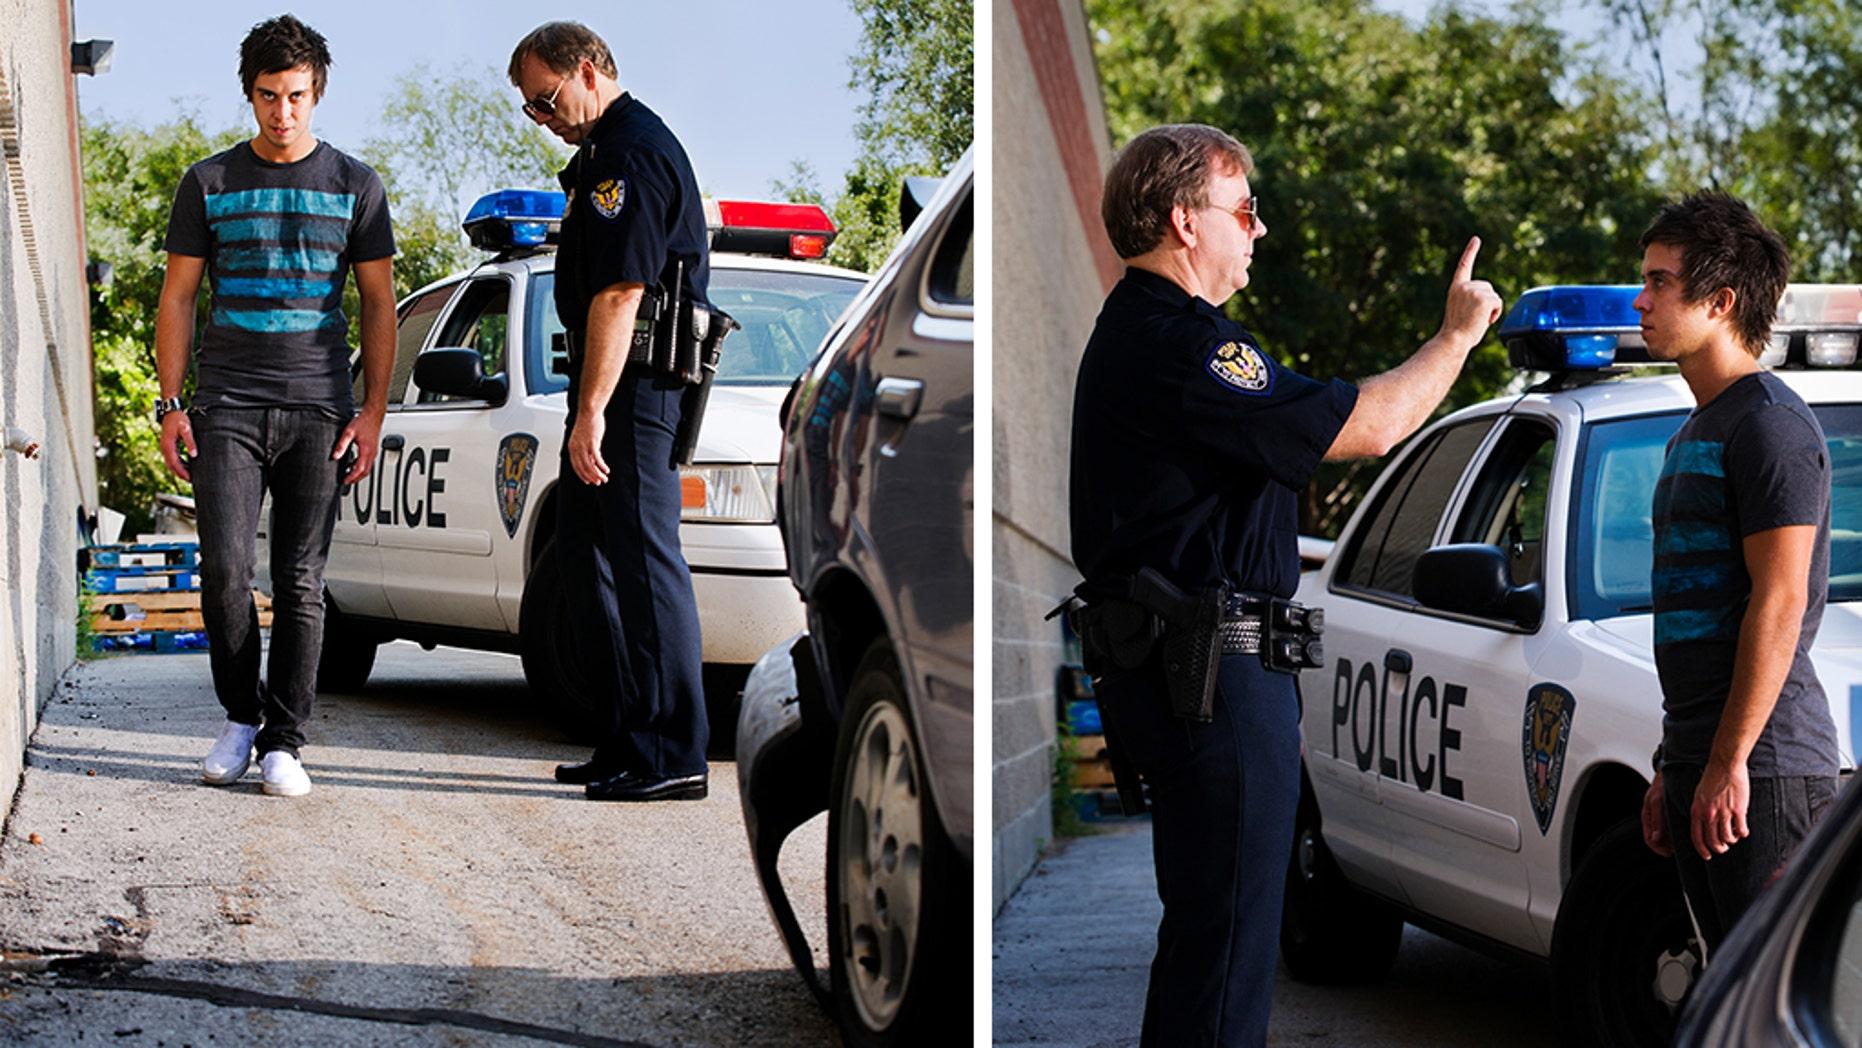 Police seek volunteers to get drunk for them; many respond